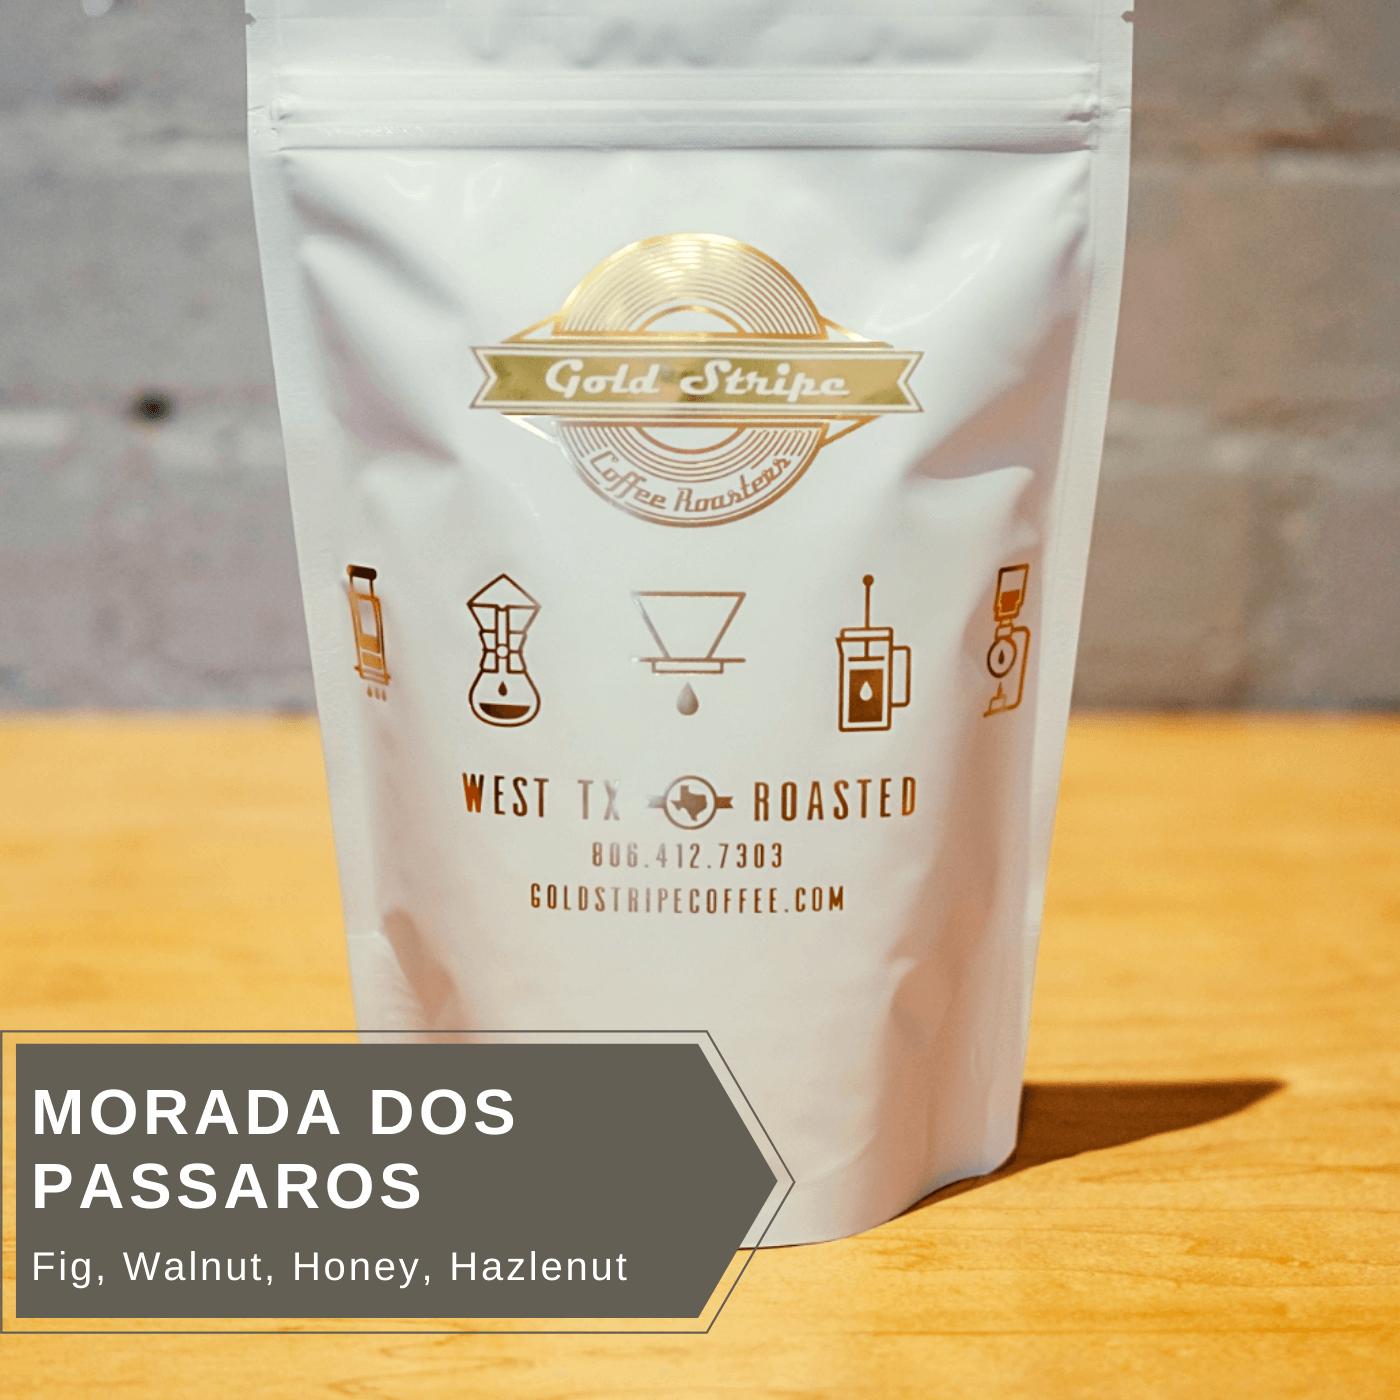 Morada Dos Passaros, Brasil from Gold Stripe Coffee